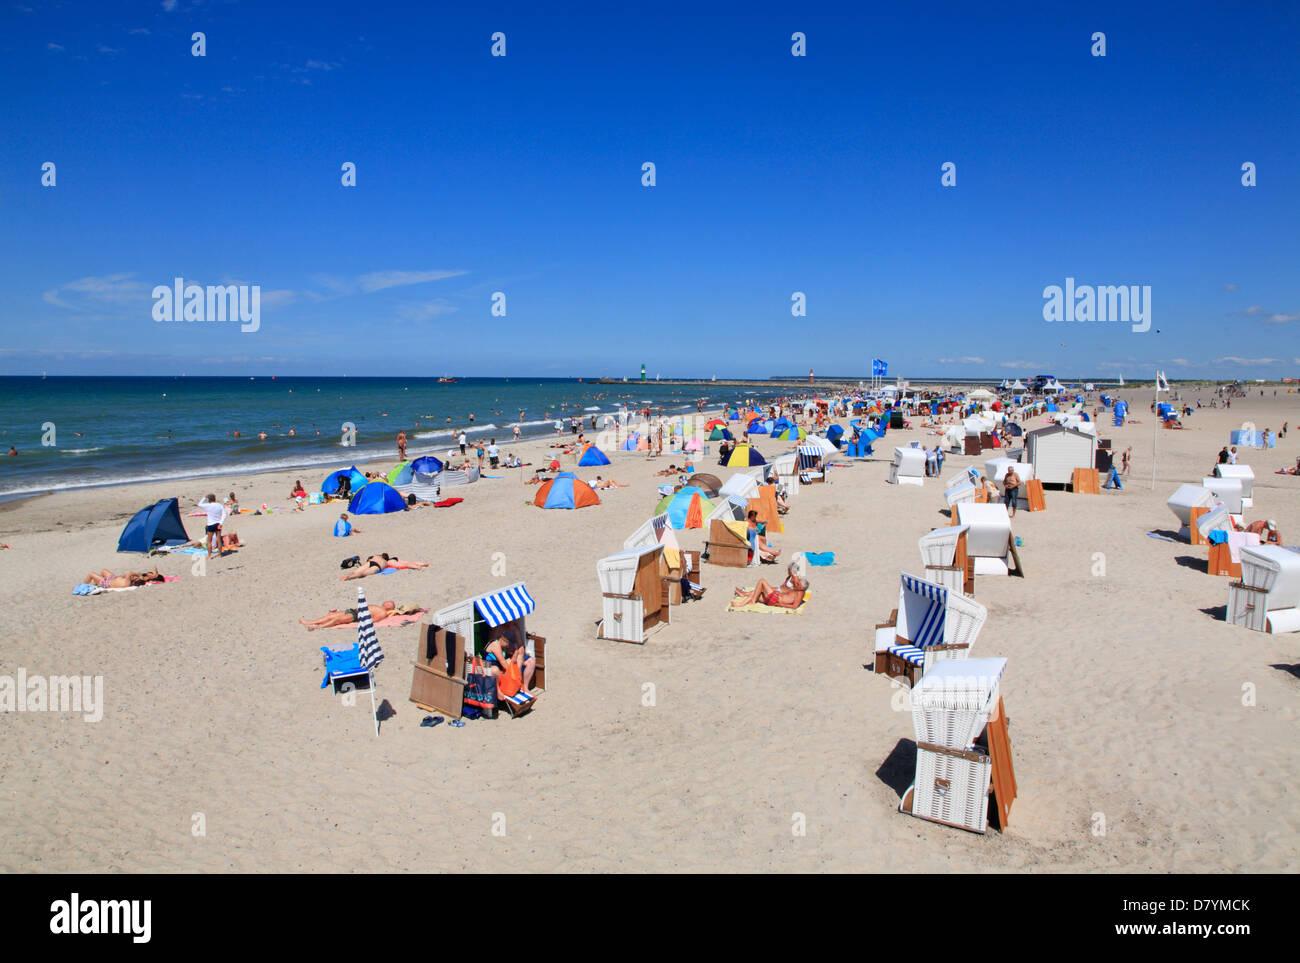 Beach in warnem nde rostock mecklenburg germany stock for Urlaub in warnemunde